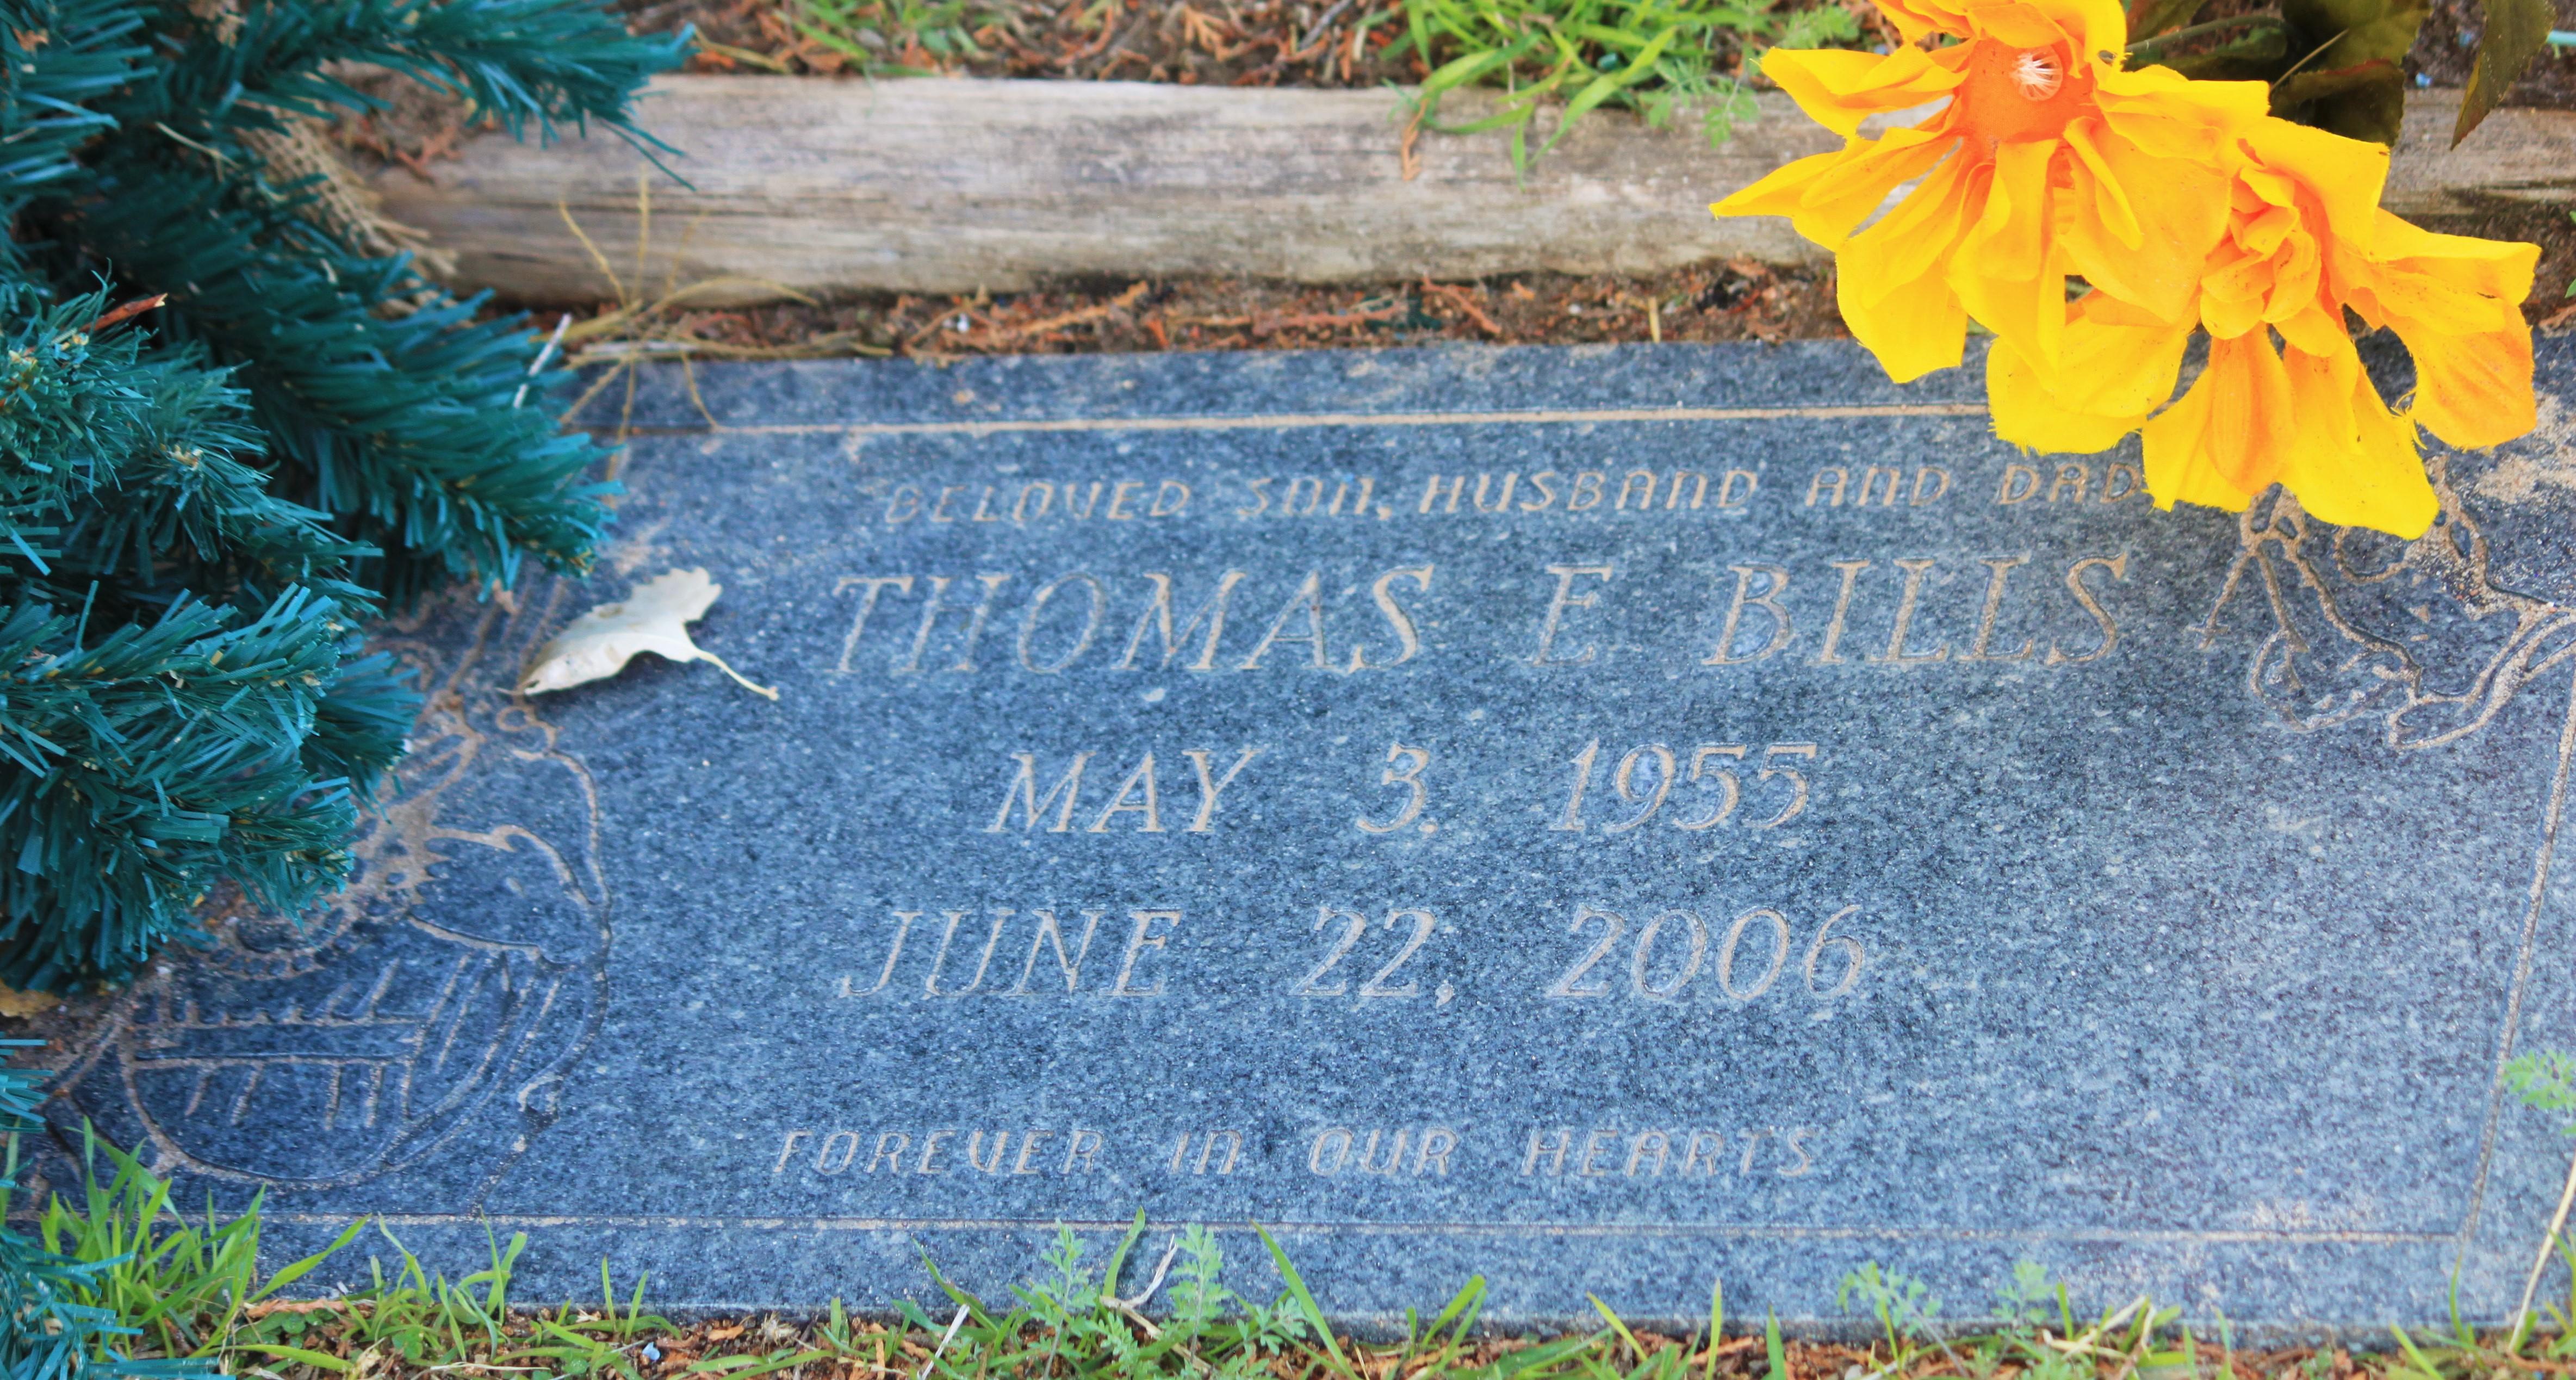 Thomas Eugene Bills